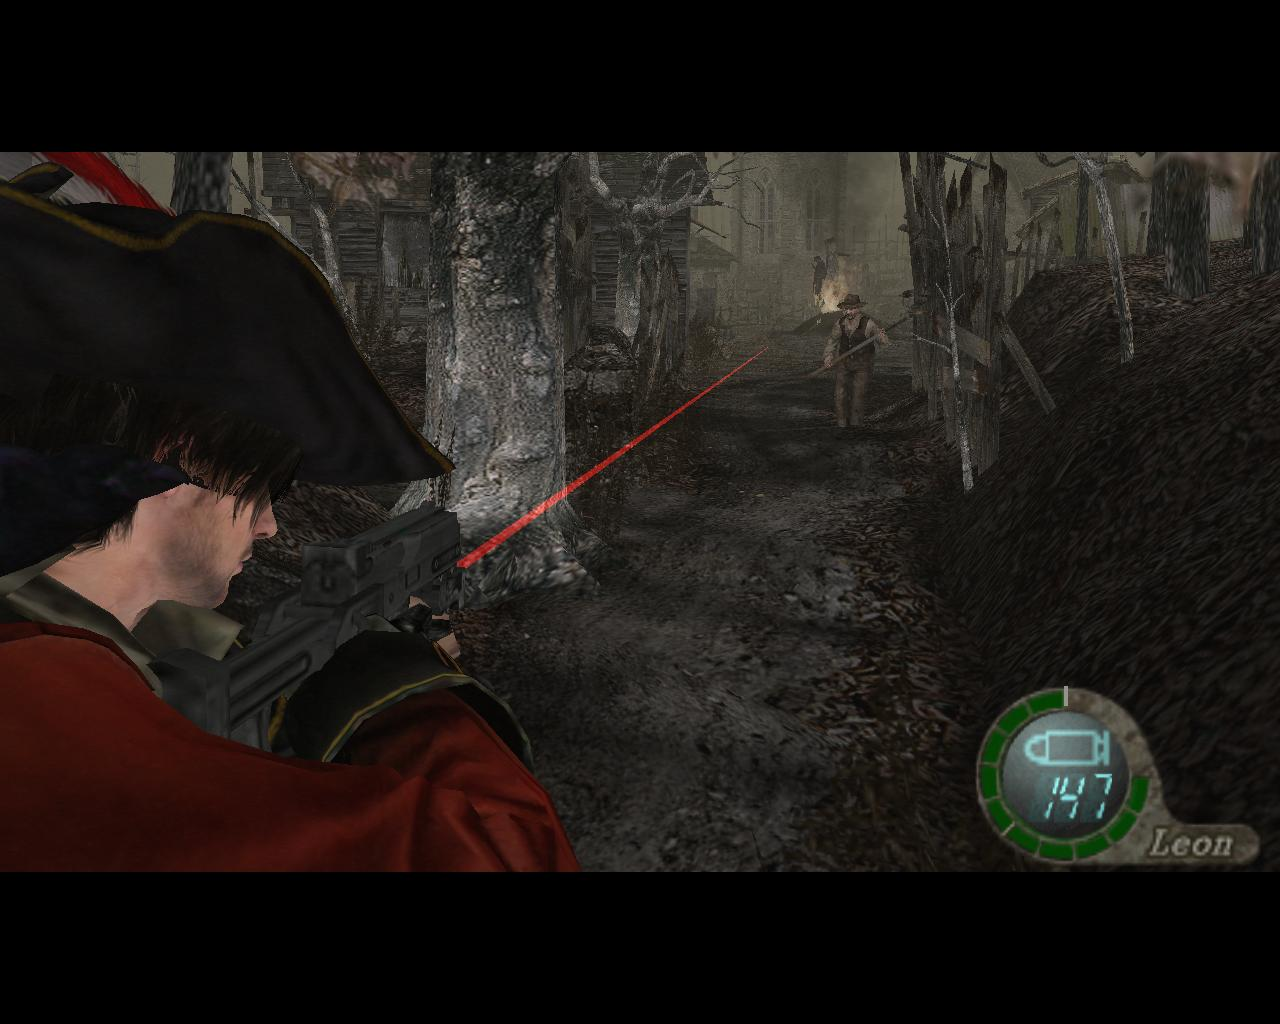 Leon_Pirate 0_10bfea_3bb40537_orig